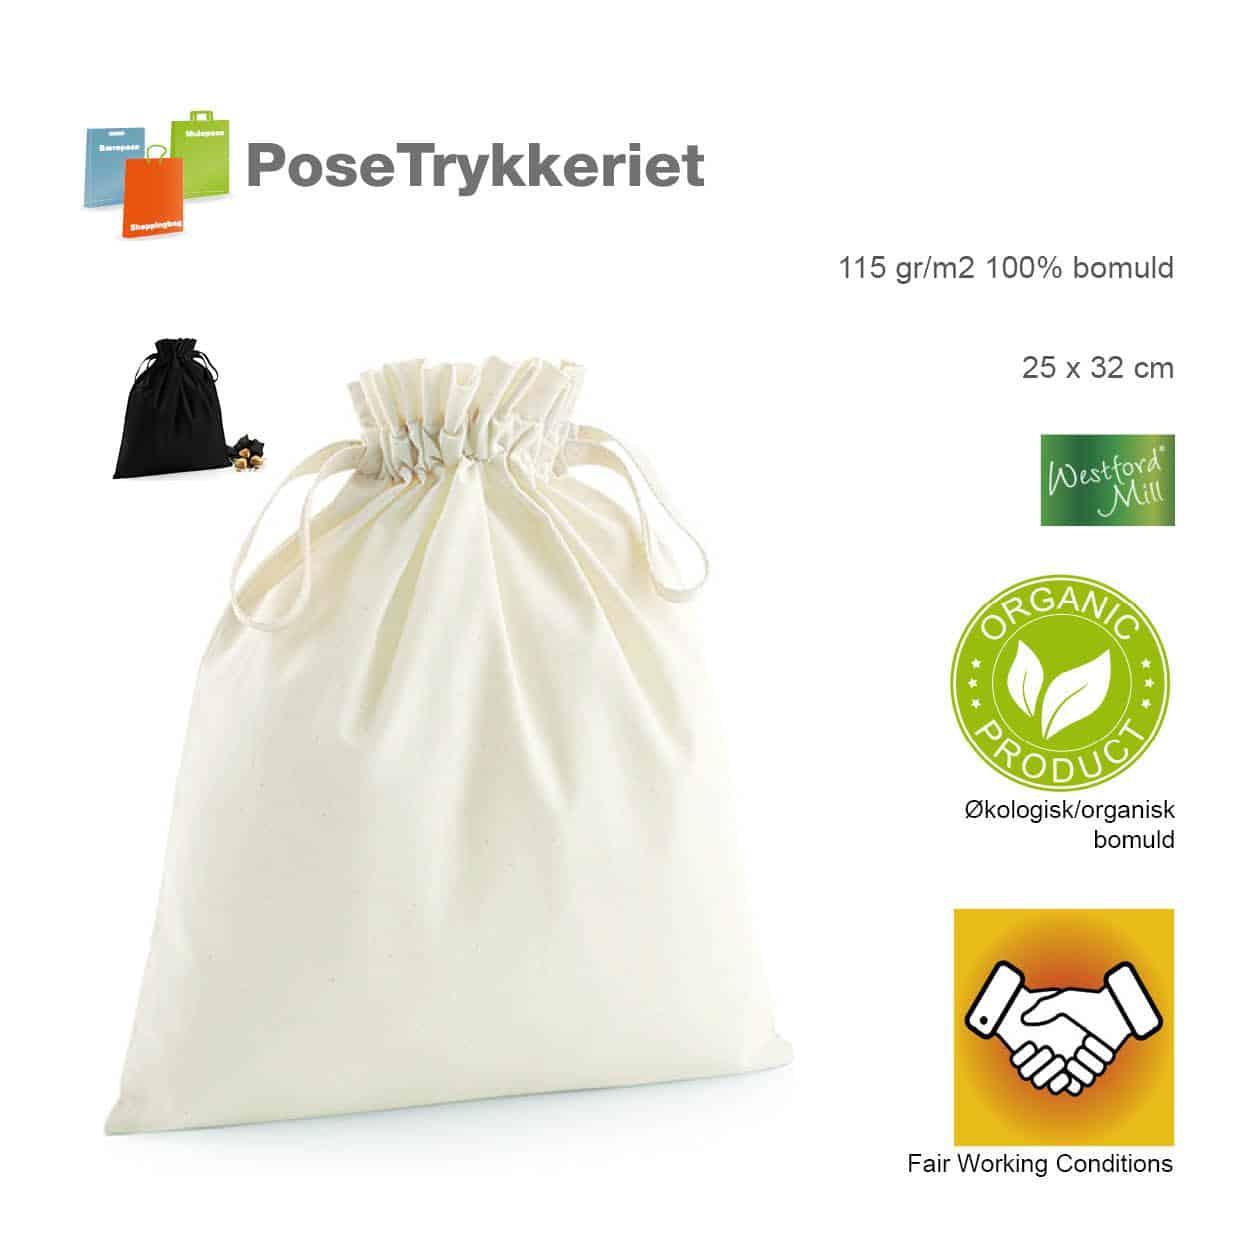 Snøreposer med logo. Økologisk bomuld. Posetrykkeriet.dk